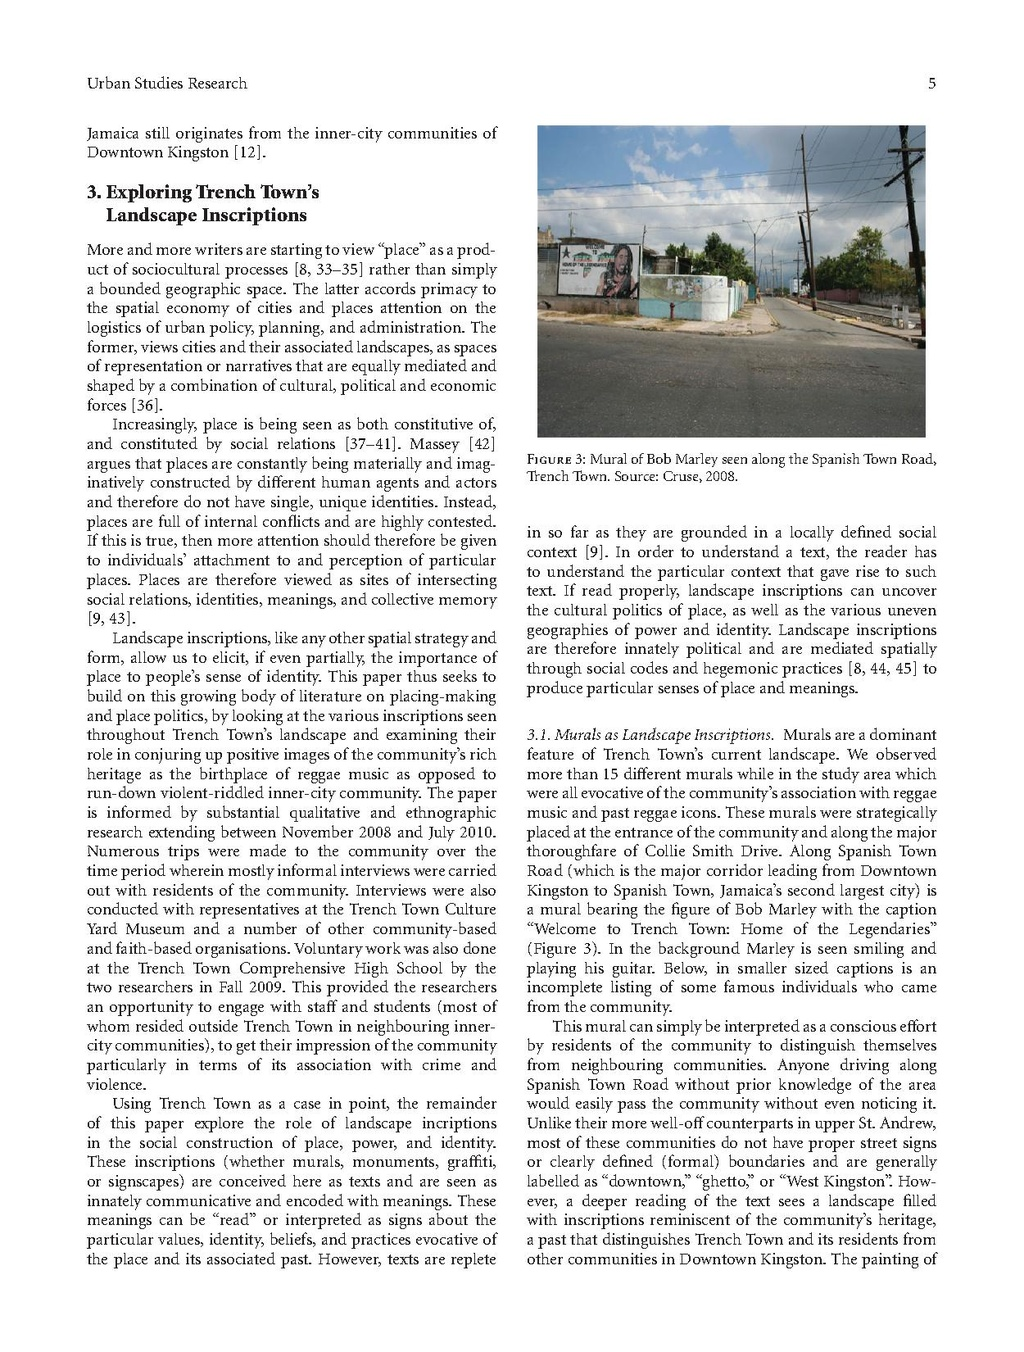 encyclopedia of human geography barney warf pdf